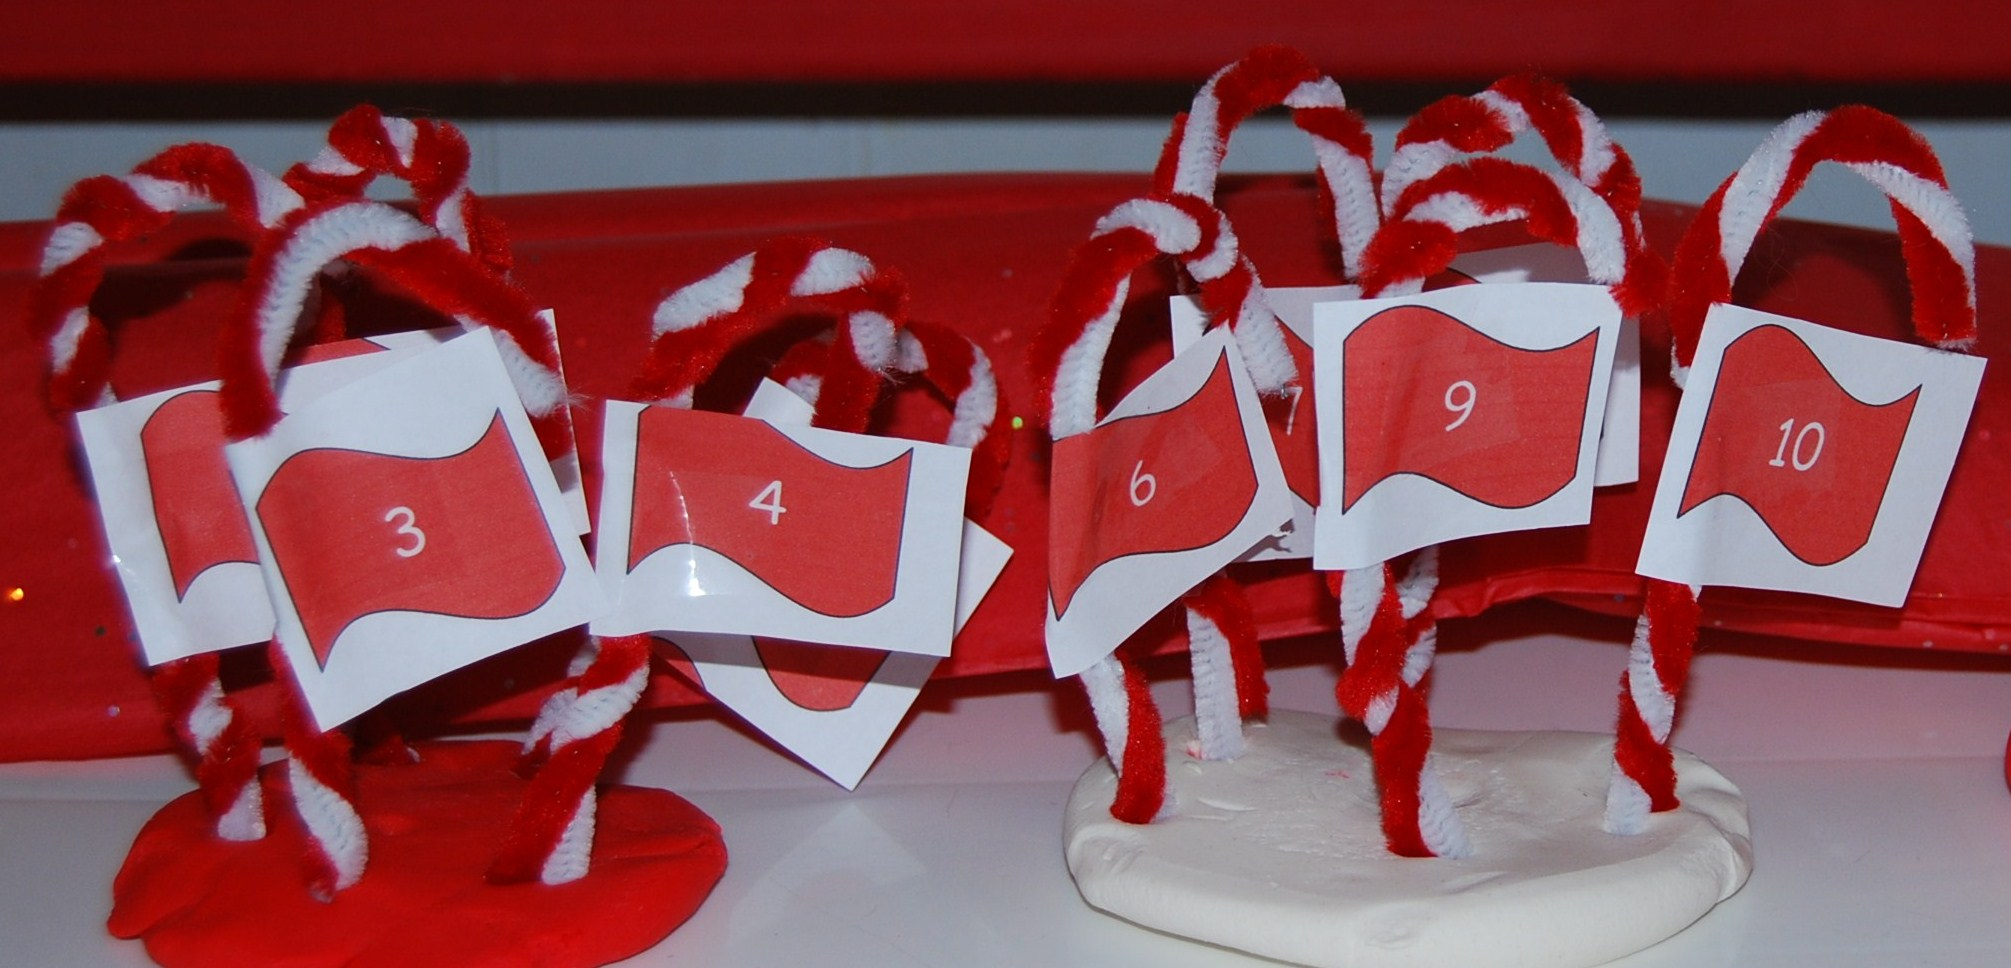 Candy Cane Sensory Math For Preschool The Preschool